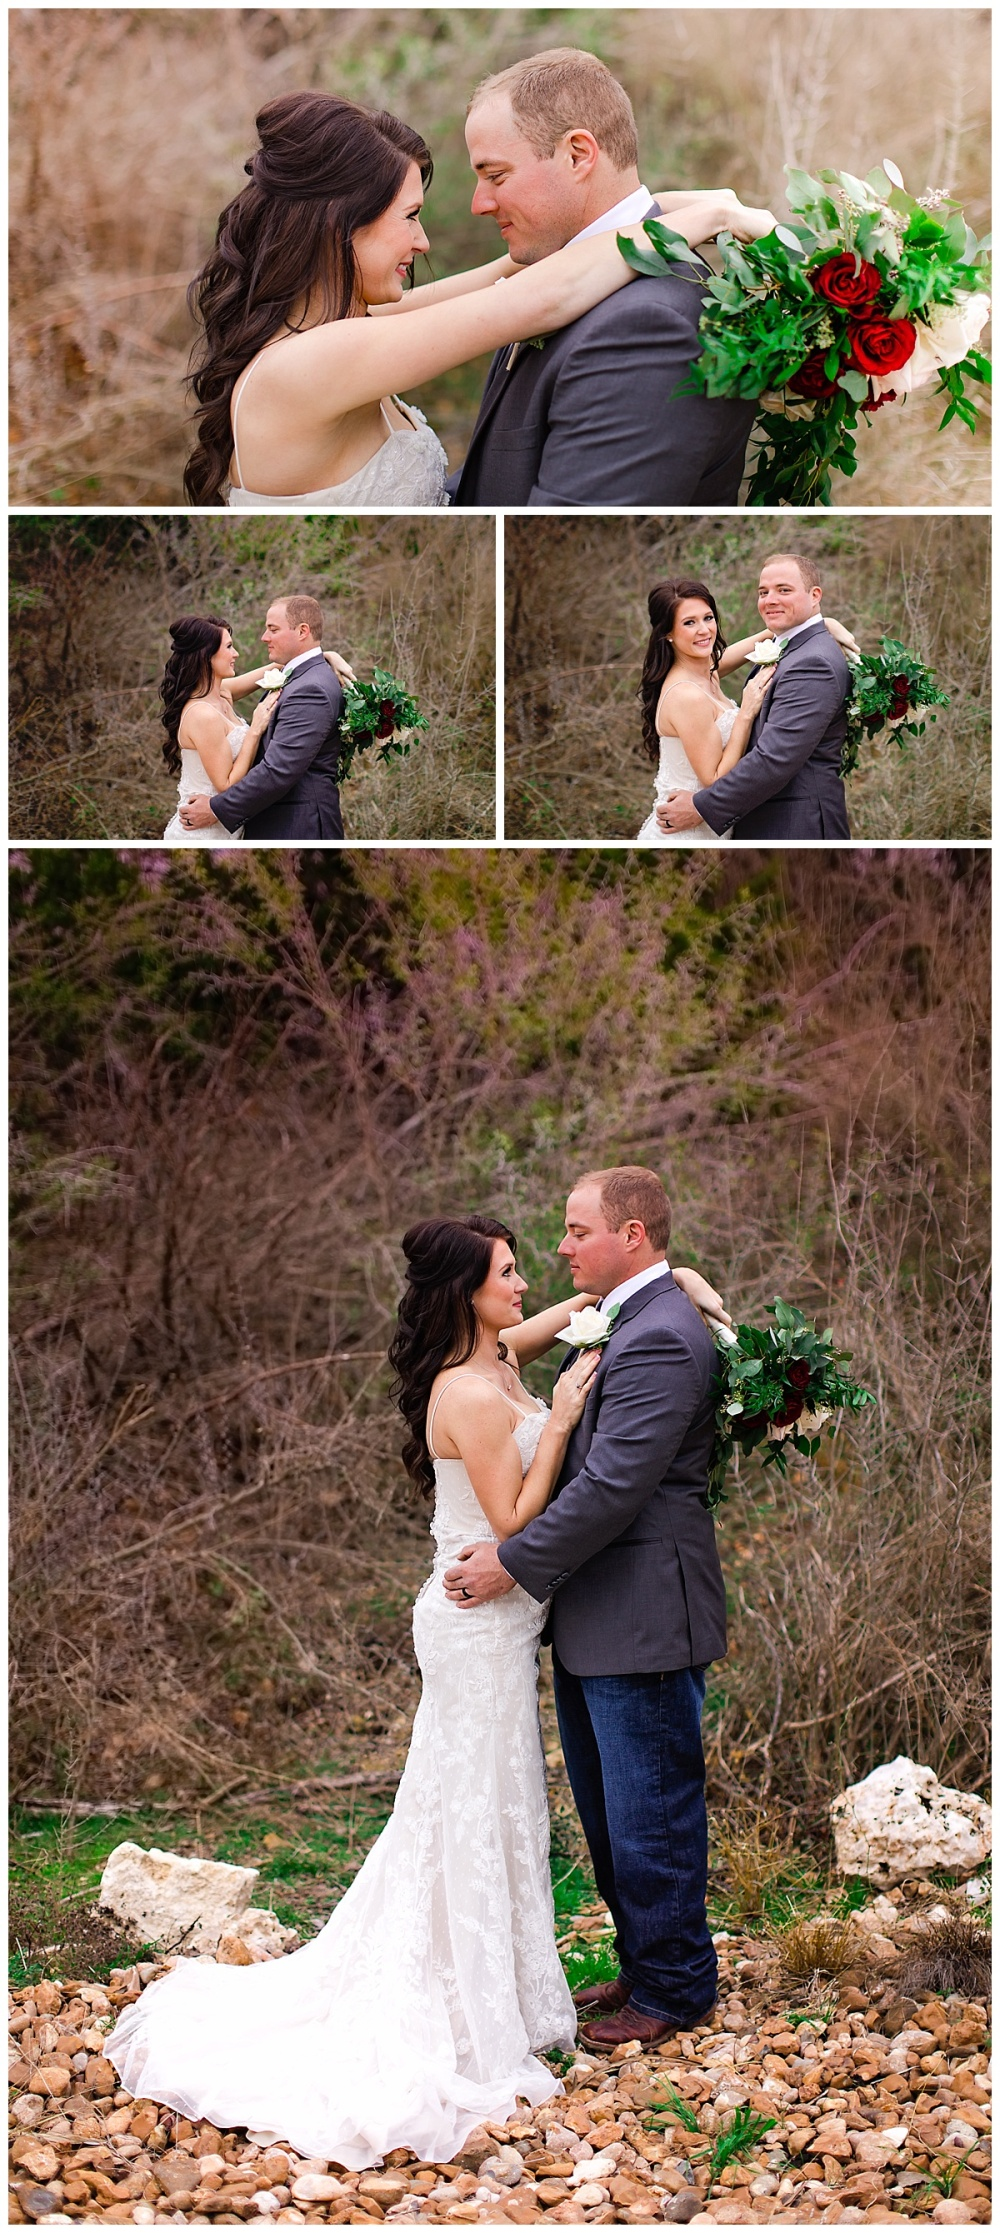 Carly-Barton-Photography-Geronimo-Oaks-Wedding-Venue-Texas-Hill-Country-Ronnie-Sarah_0067.jpg